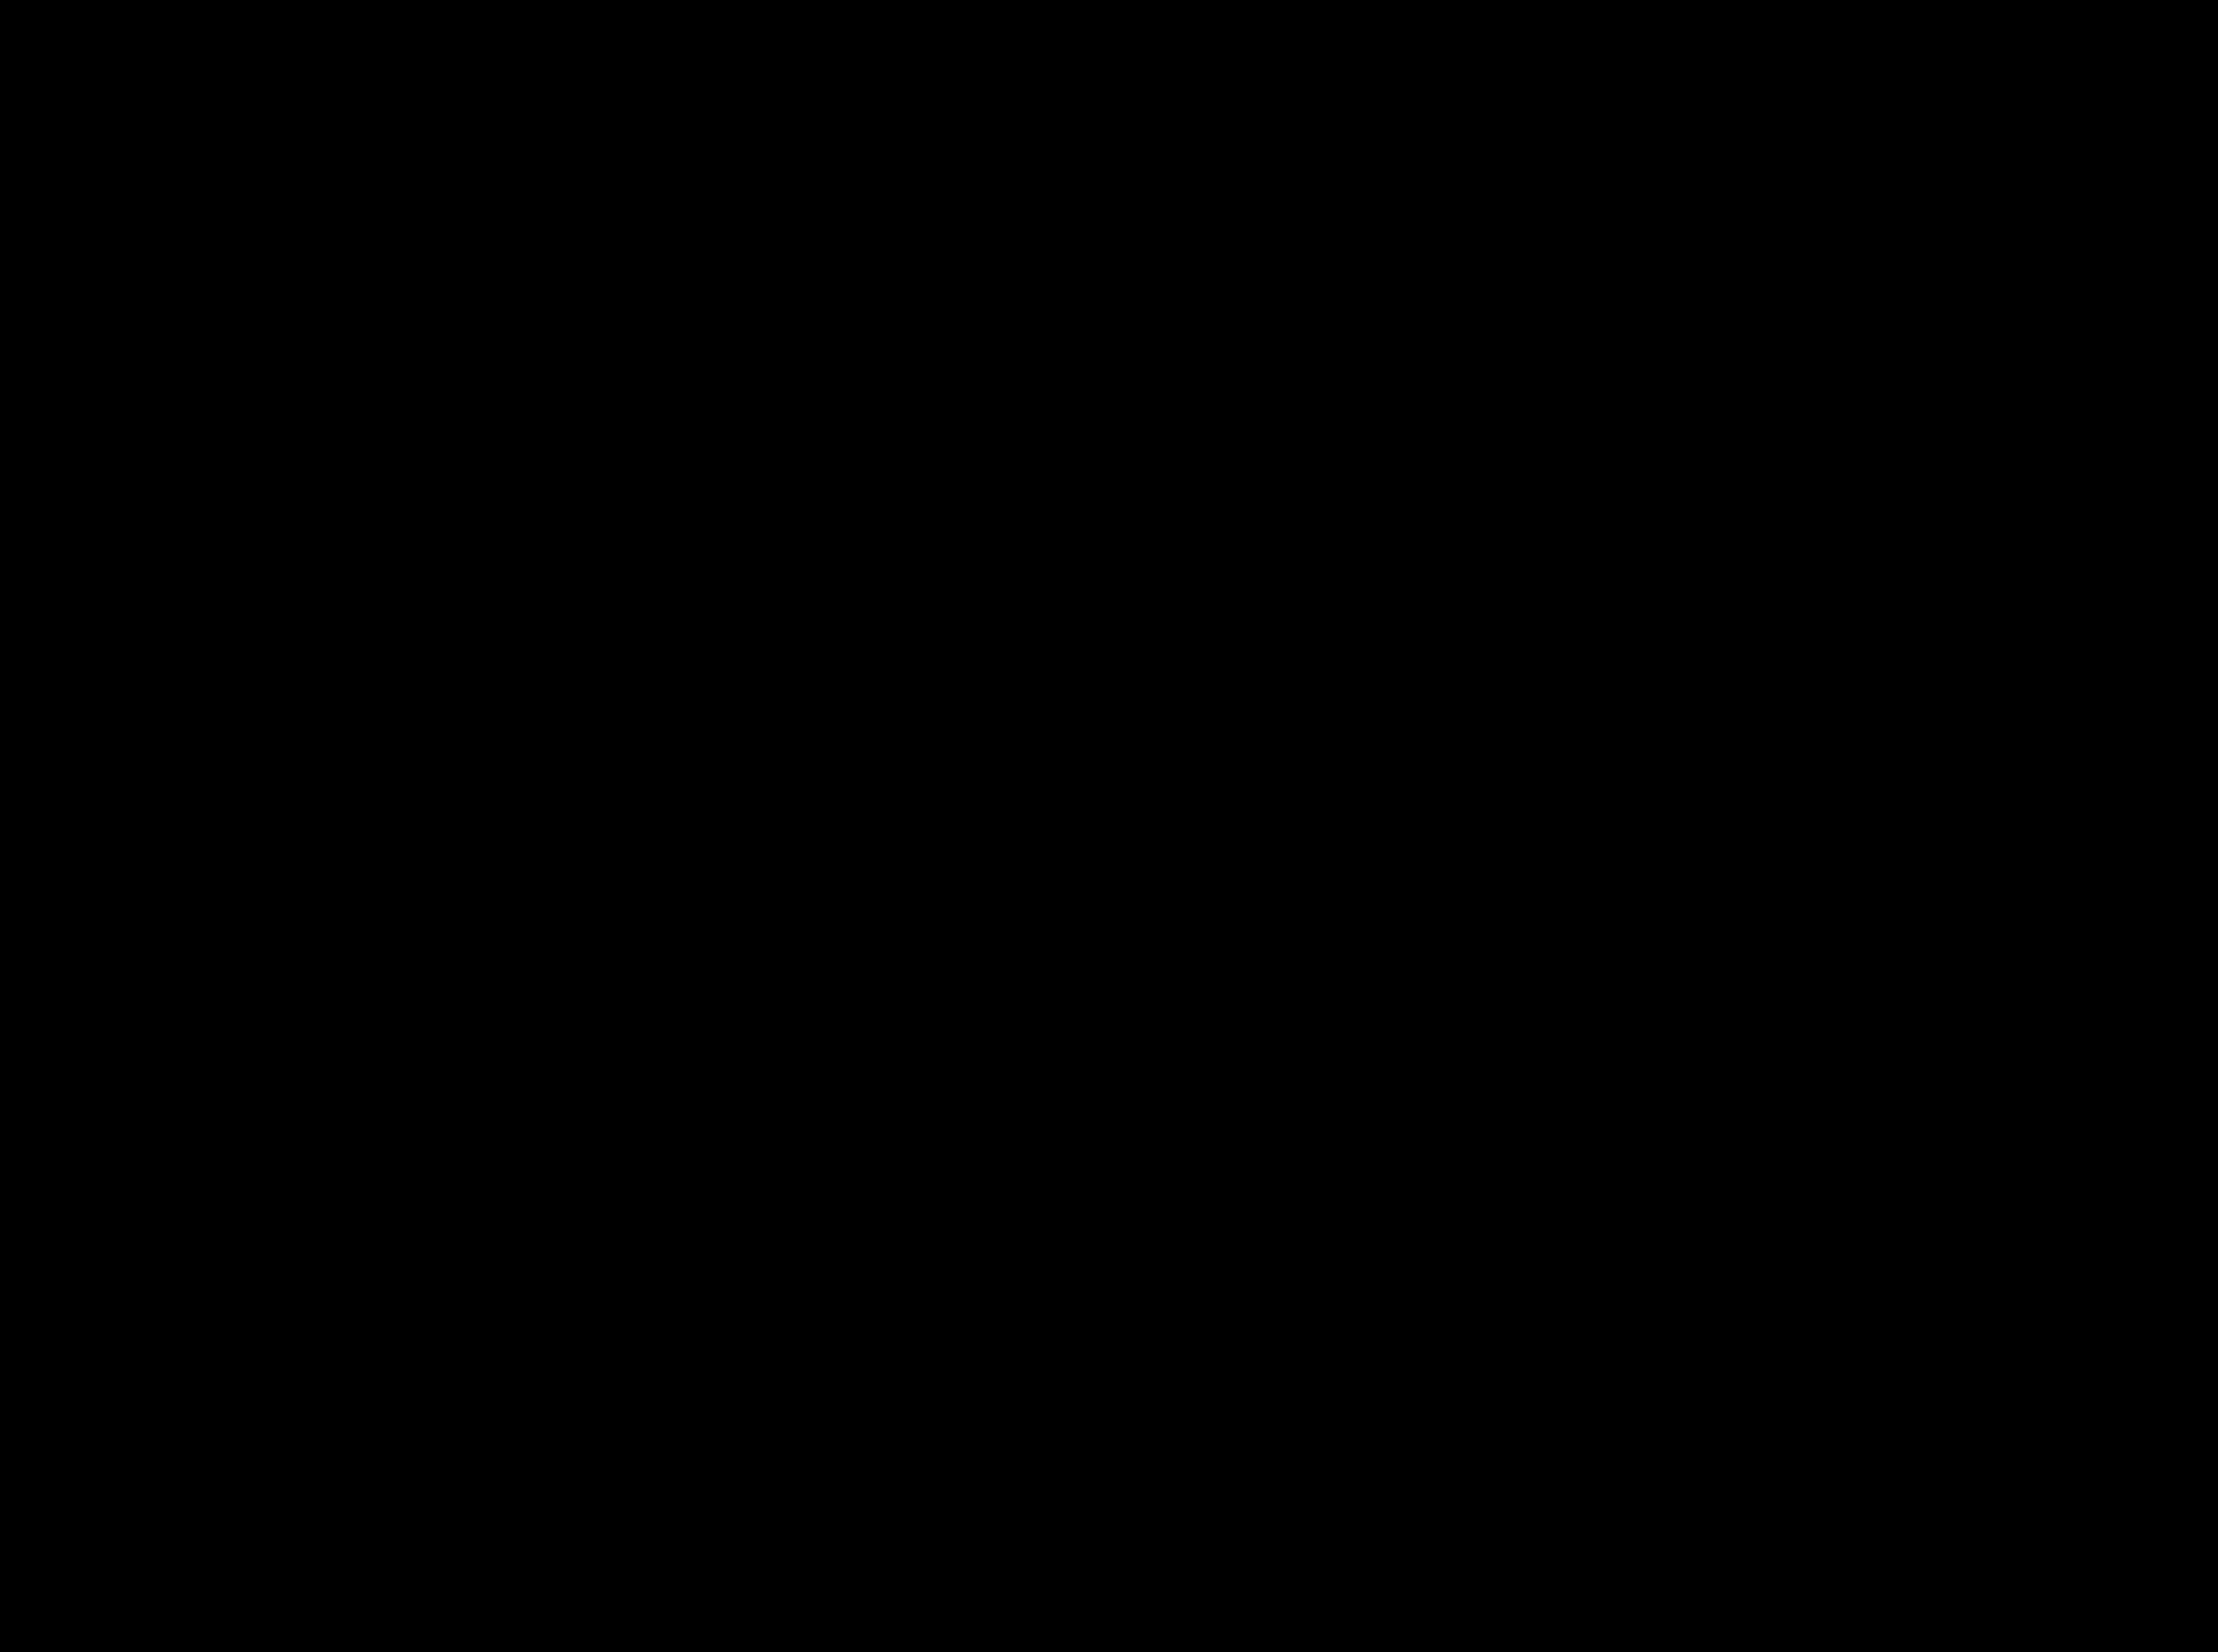 ga-zoltan-black.png